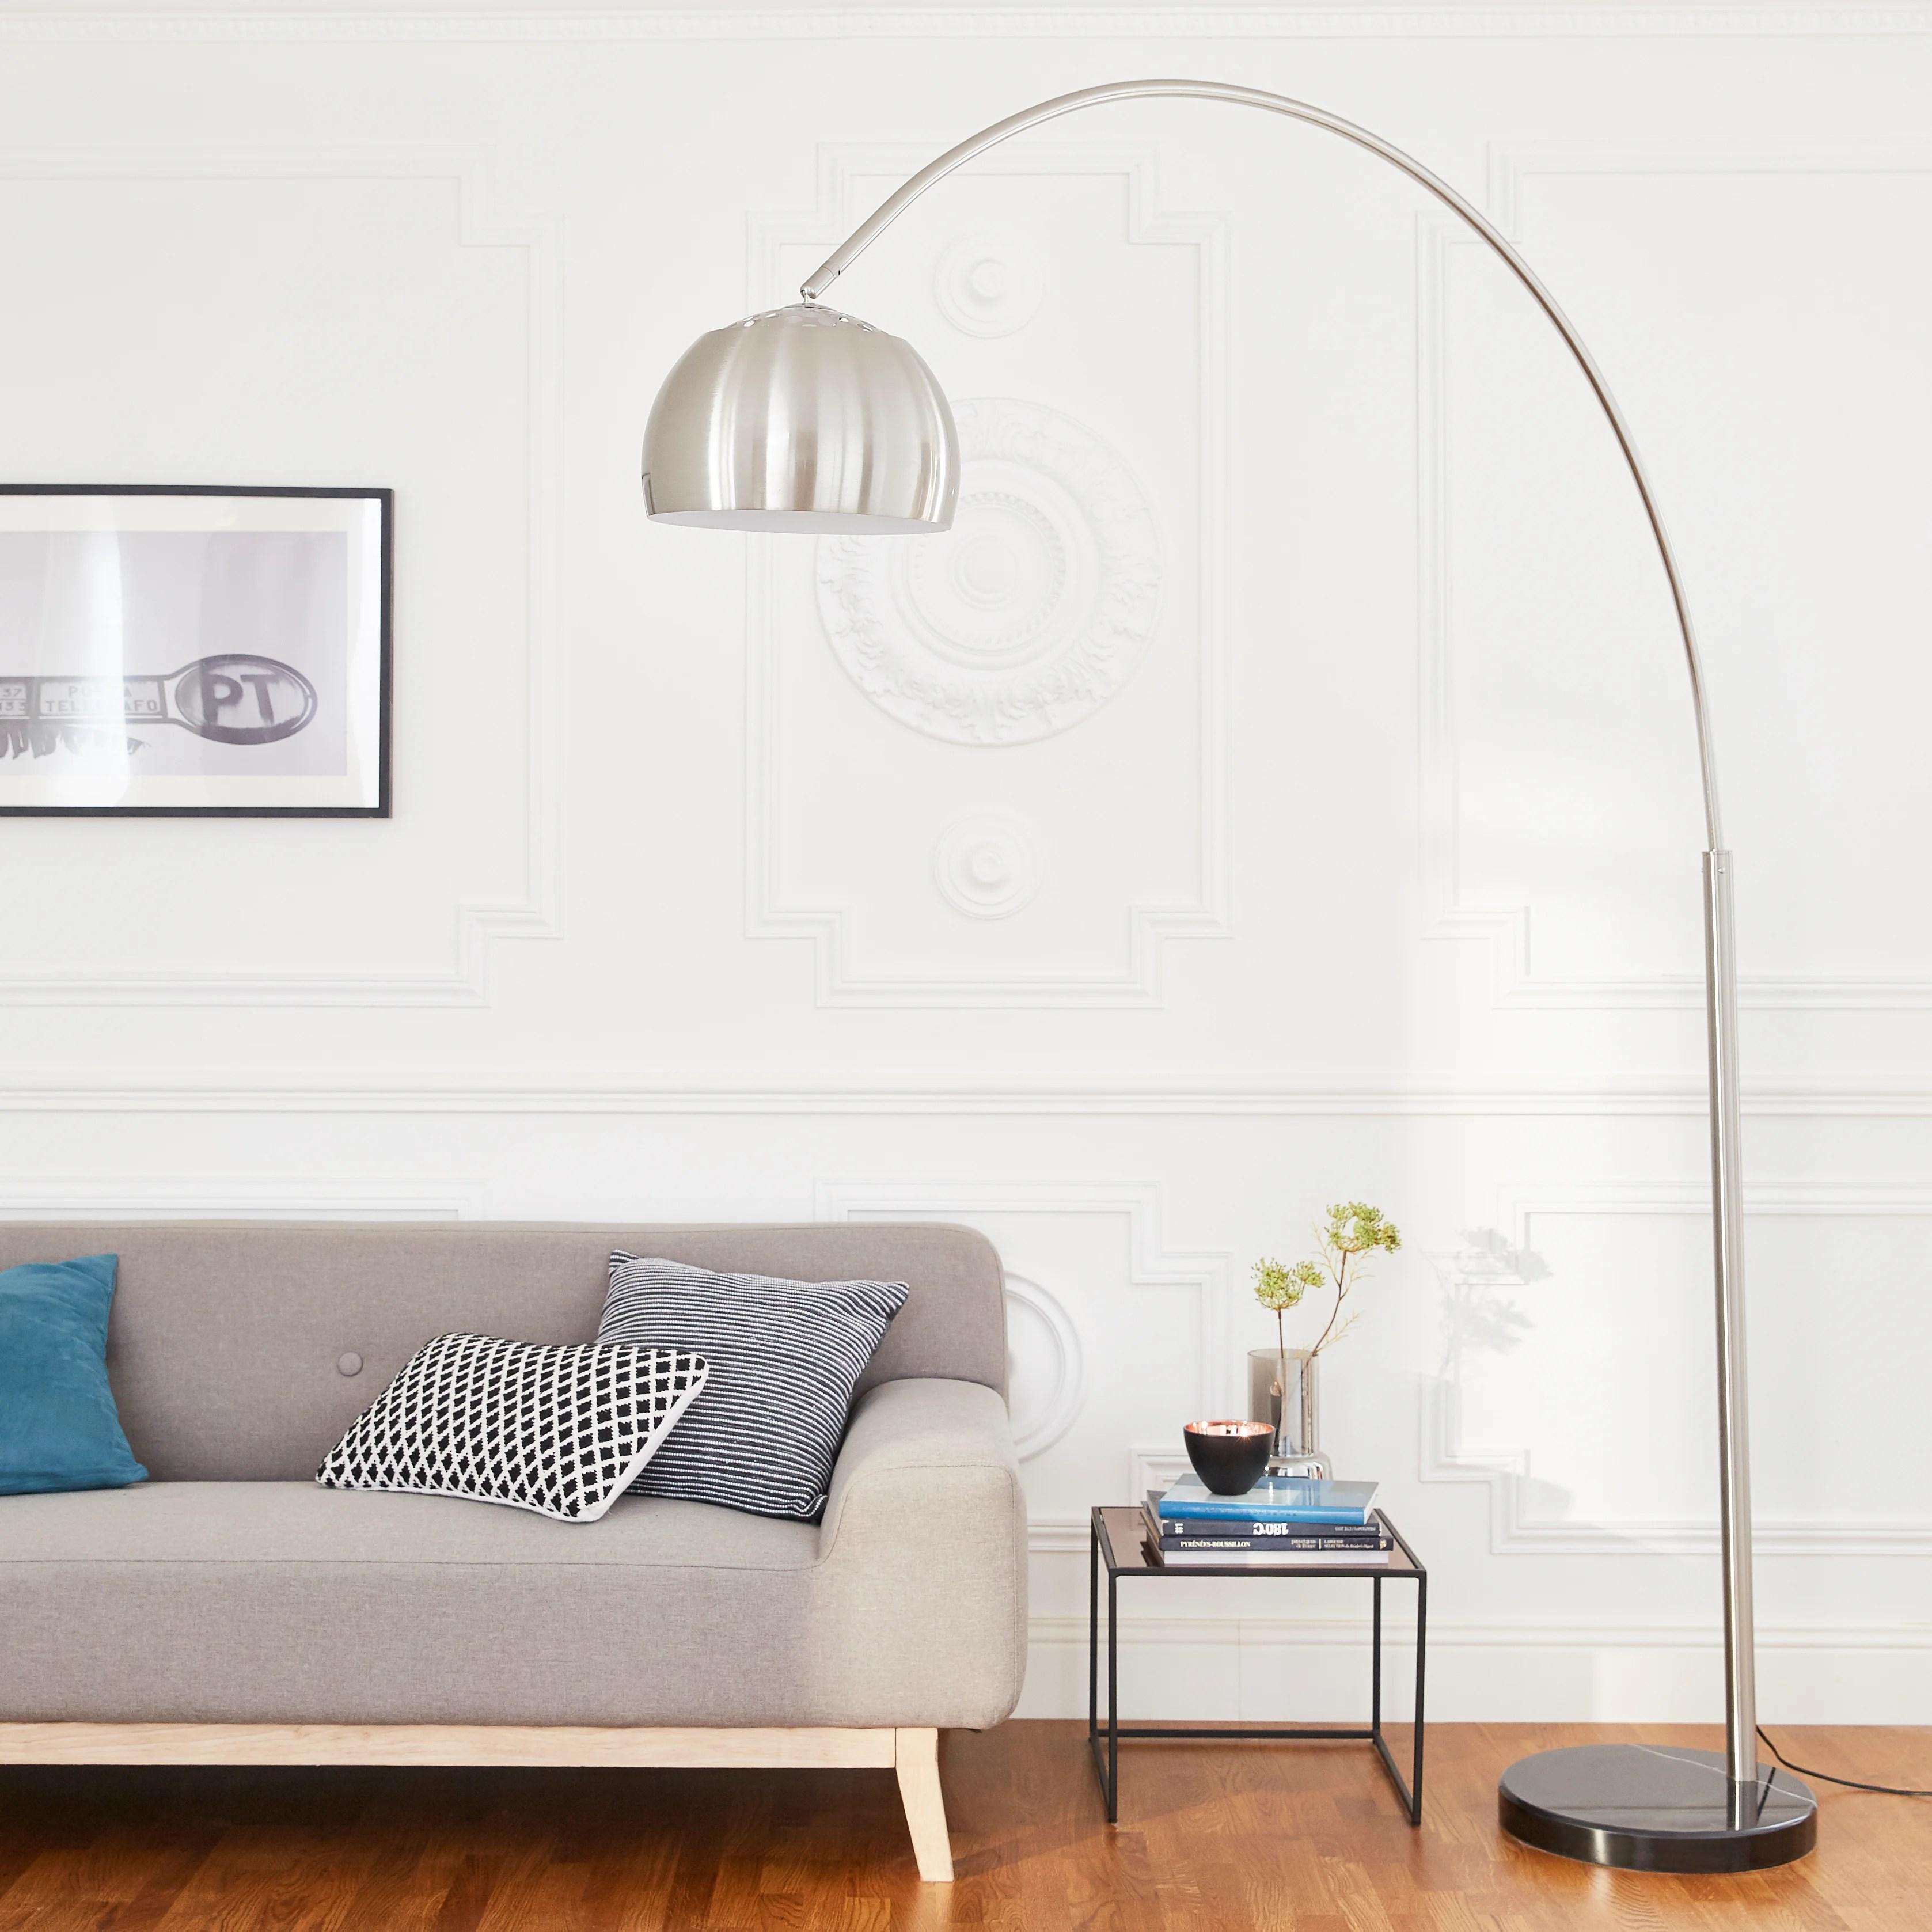 Lampadaire Arc Metal Inspire Big Sofa Leroy Merlin